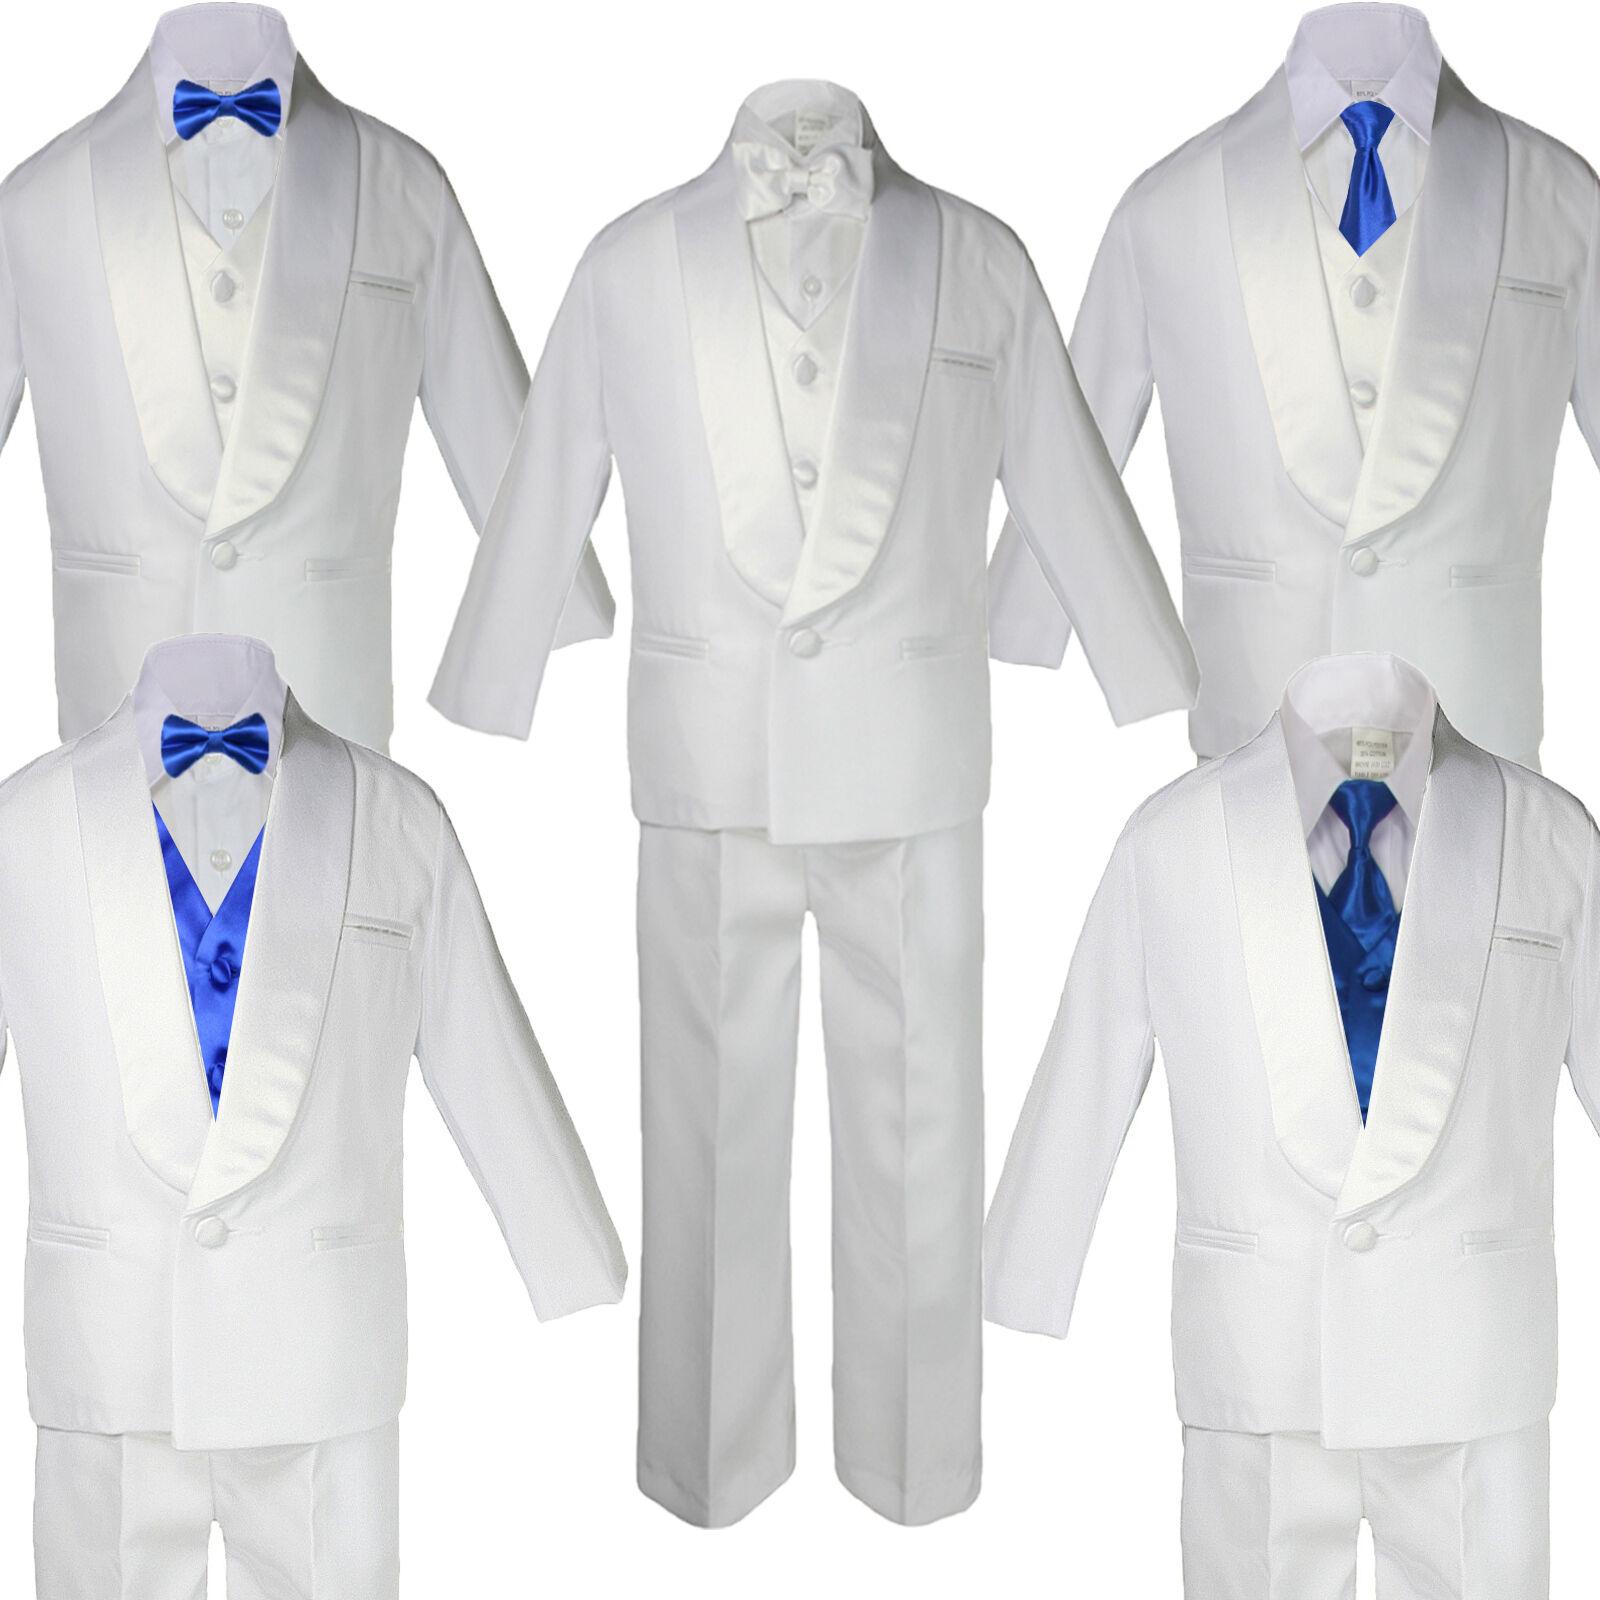 5-7pc Baby White Satin Shawl Lapel Suit Tuxedo Royal Blue...